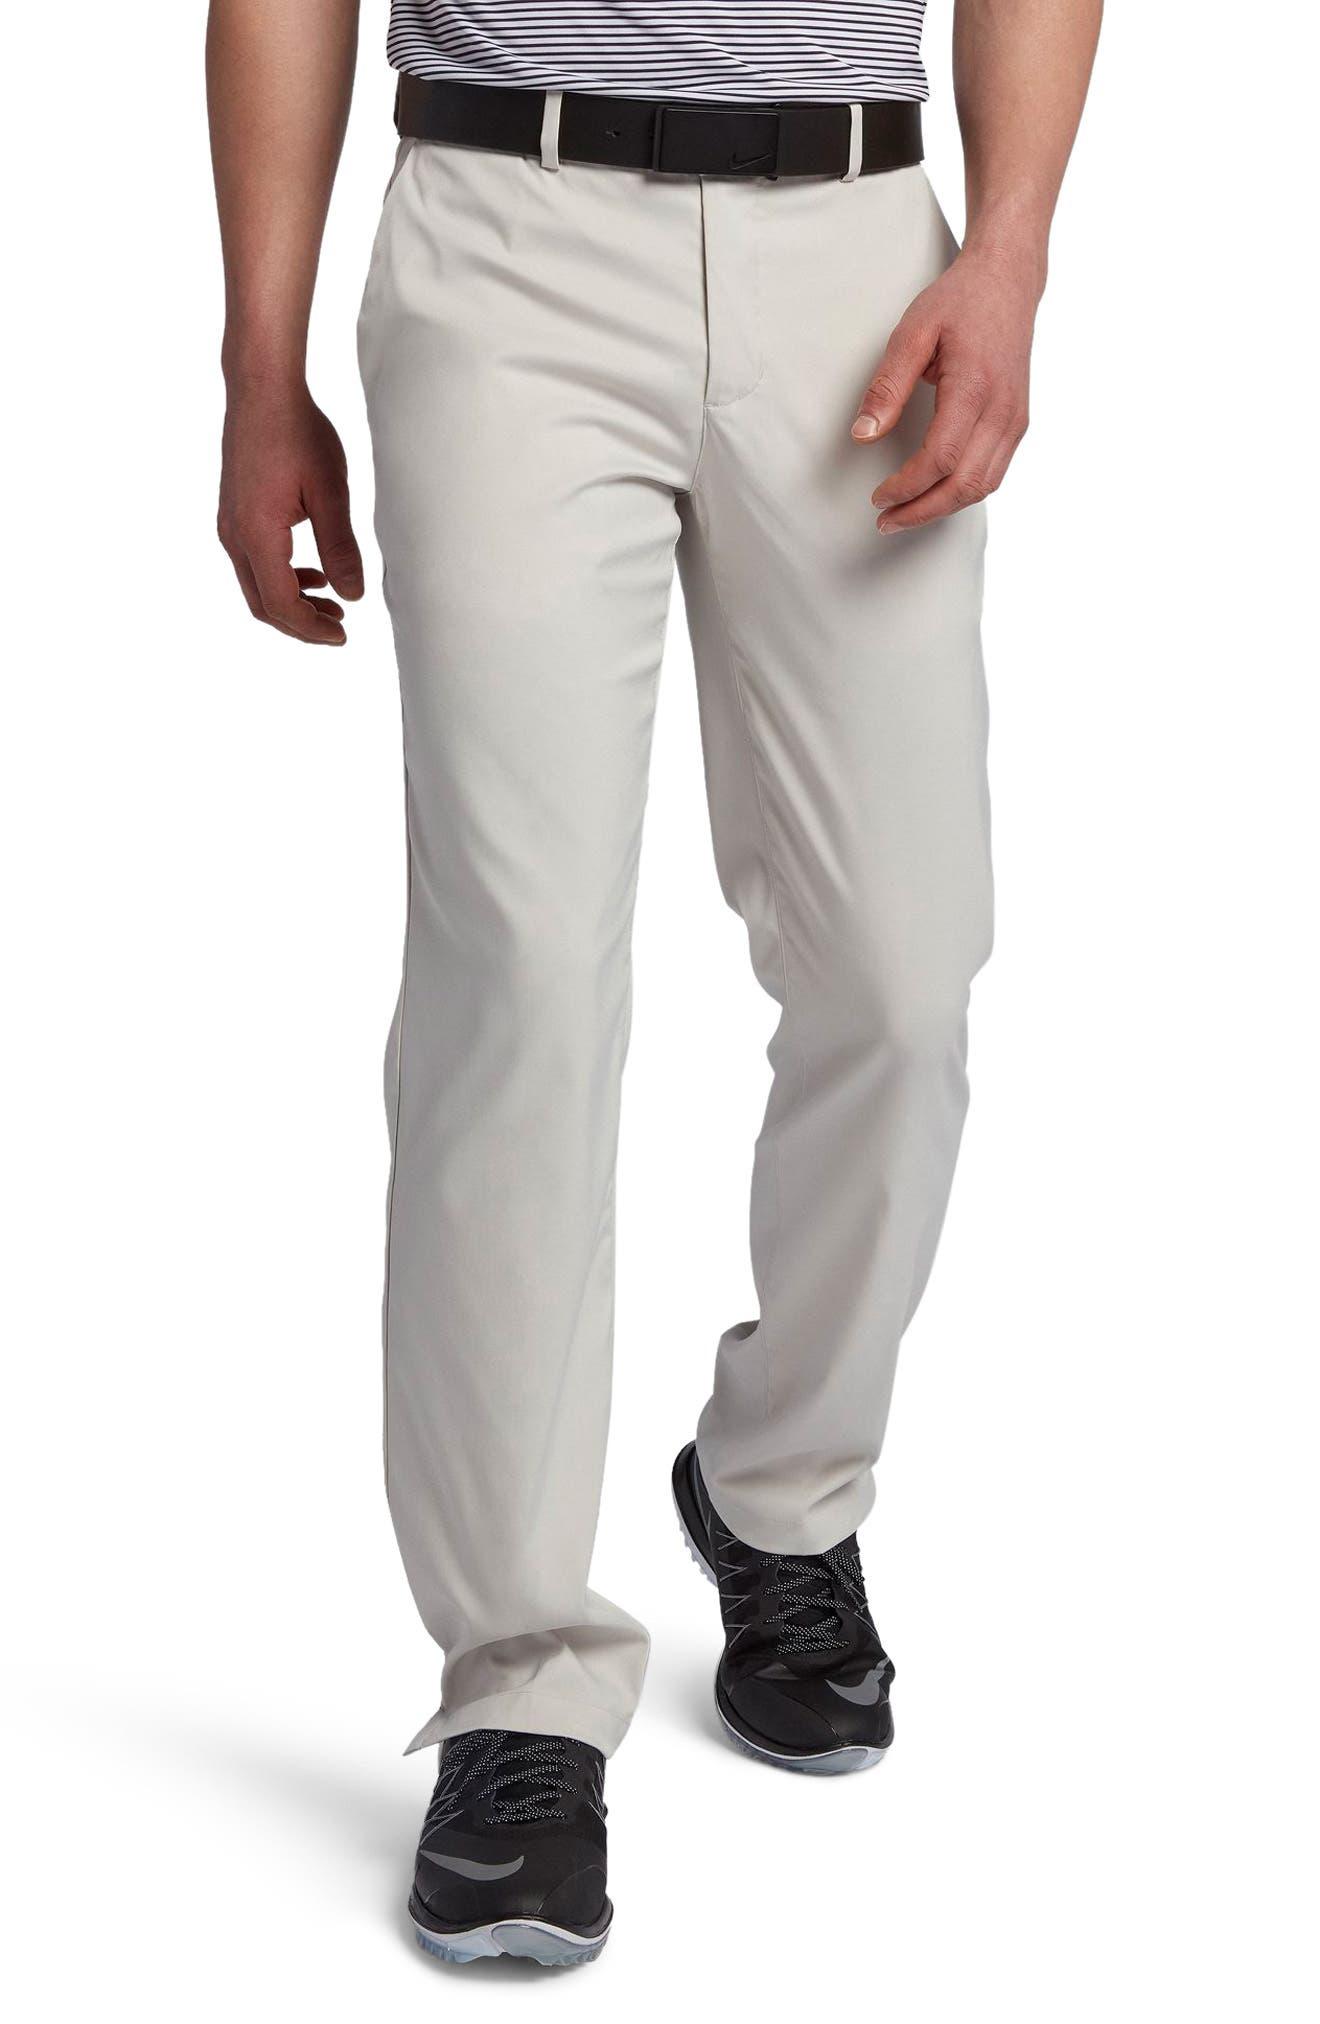 Flat Front Dri-FIT Tech Golf Pants, Main, color, LIGHT BONE/ LIGHT BONE